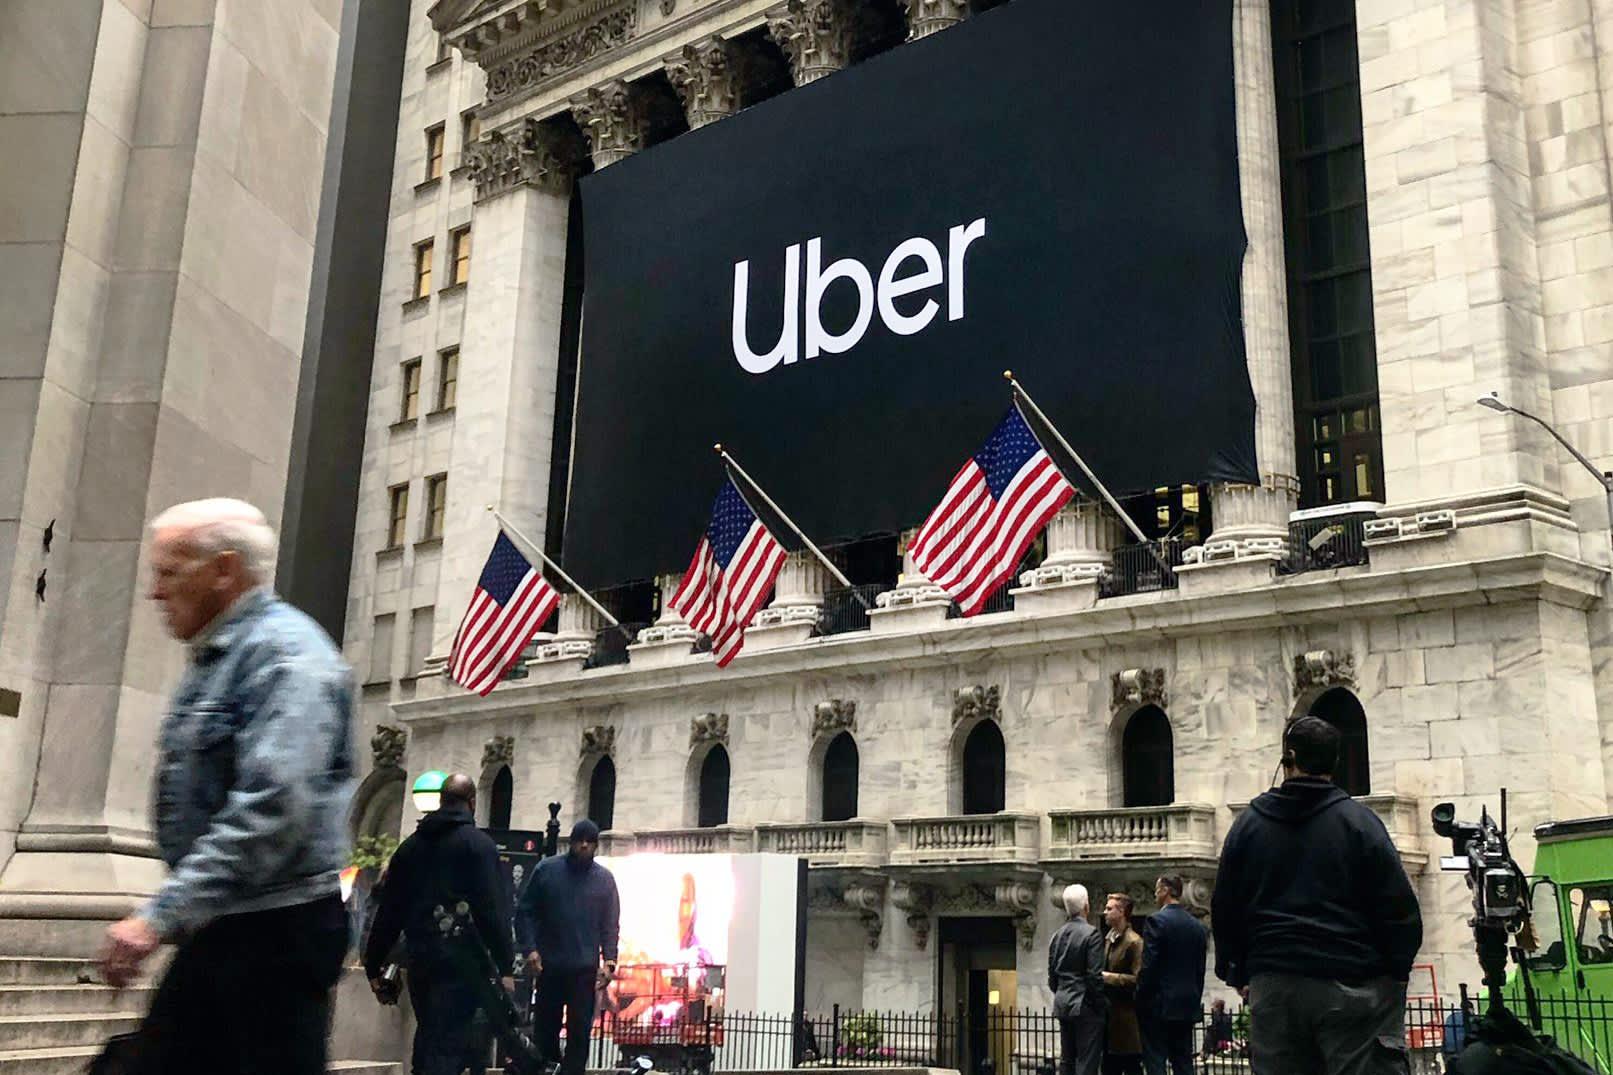 Stocks making the biggest moves midday: Uber, Tesla, Ulta, Zoom Video & more